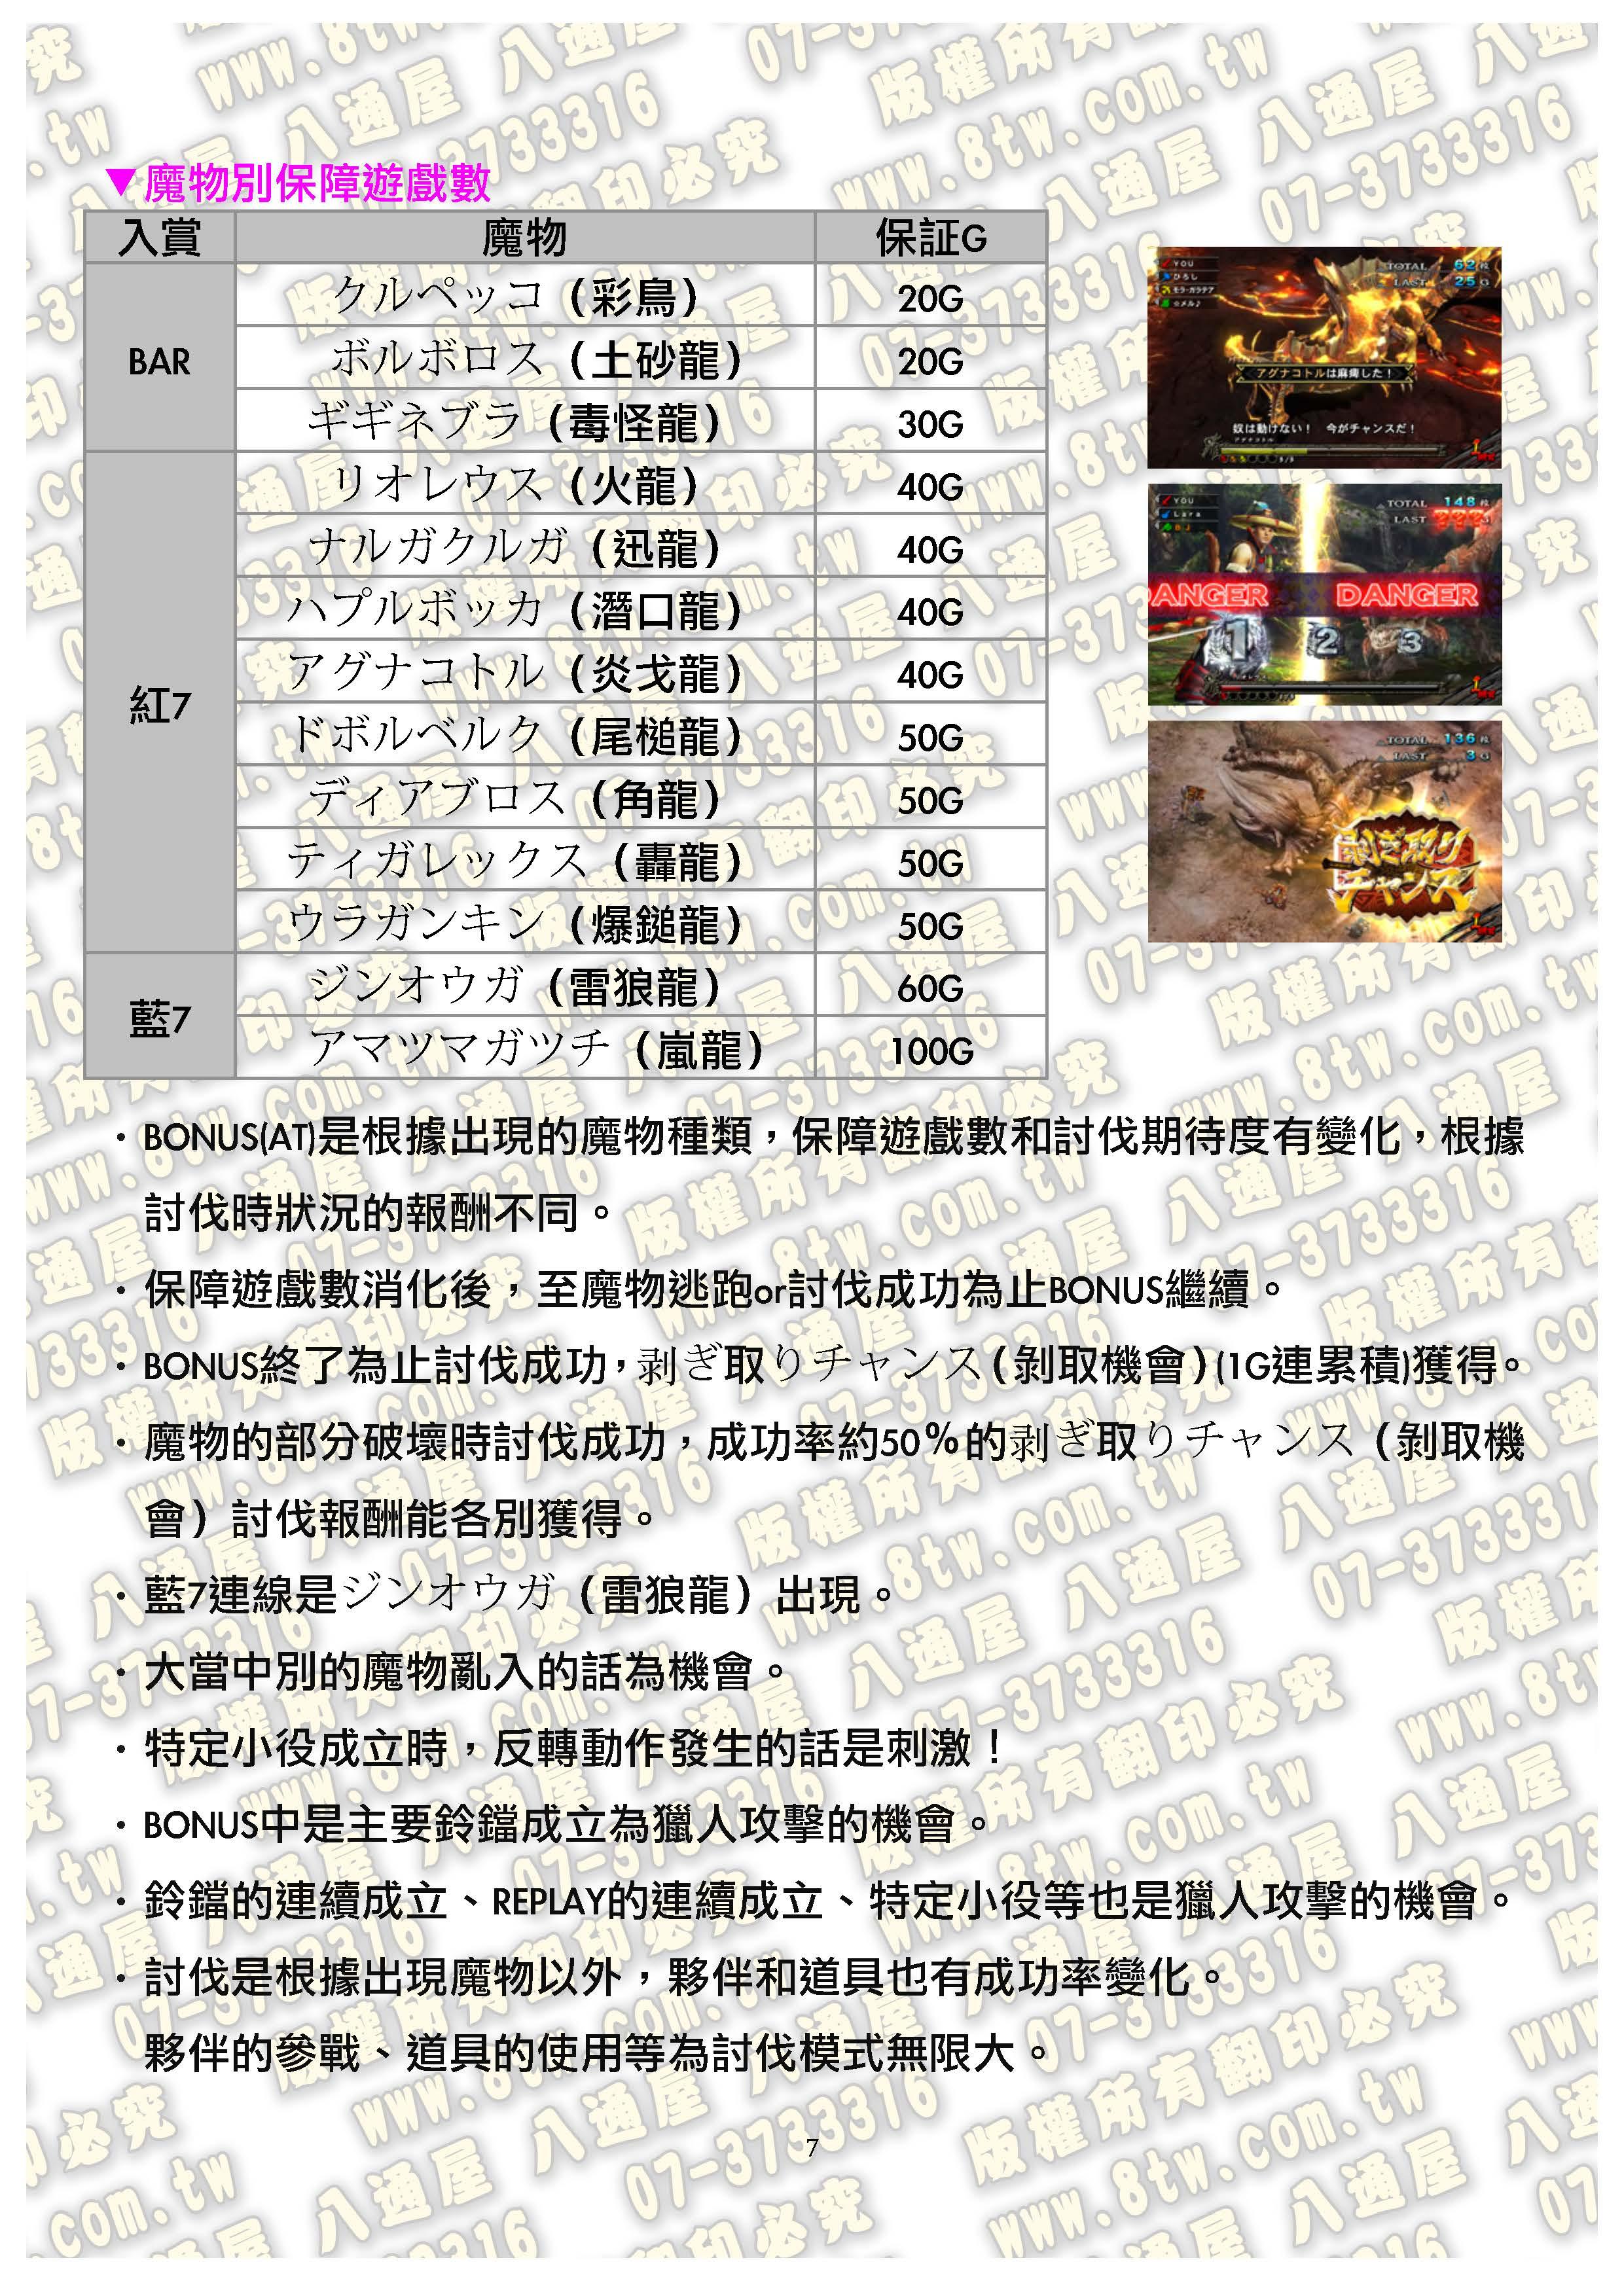 S0202魔物獵人 月下雷鳴 中文版攻略_Page_08